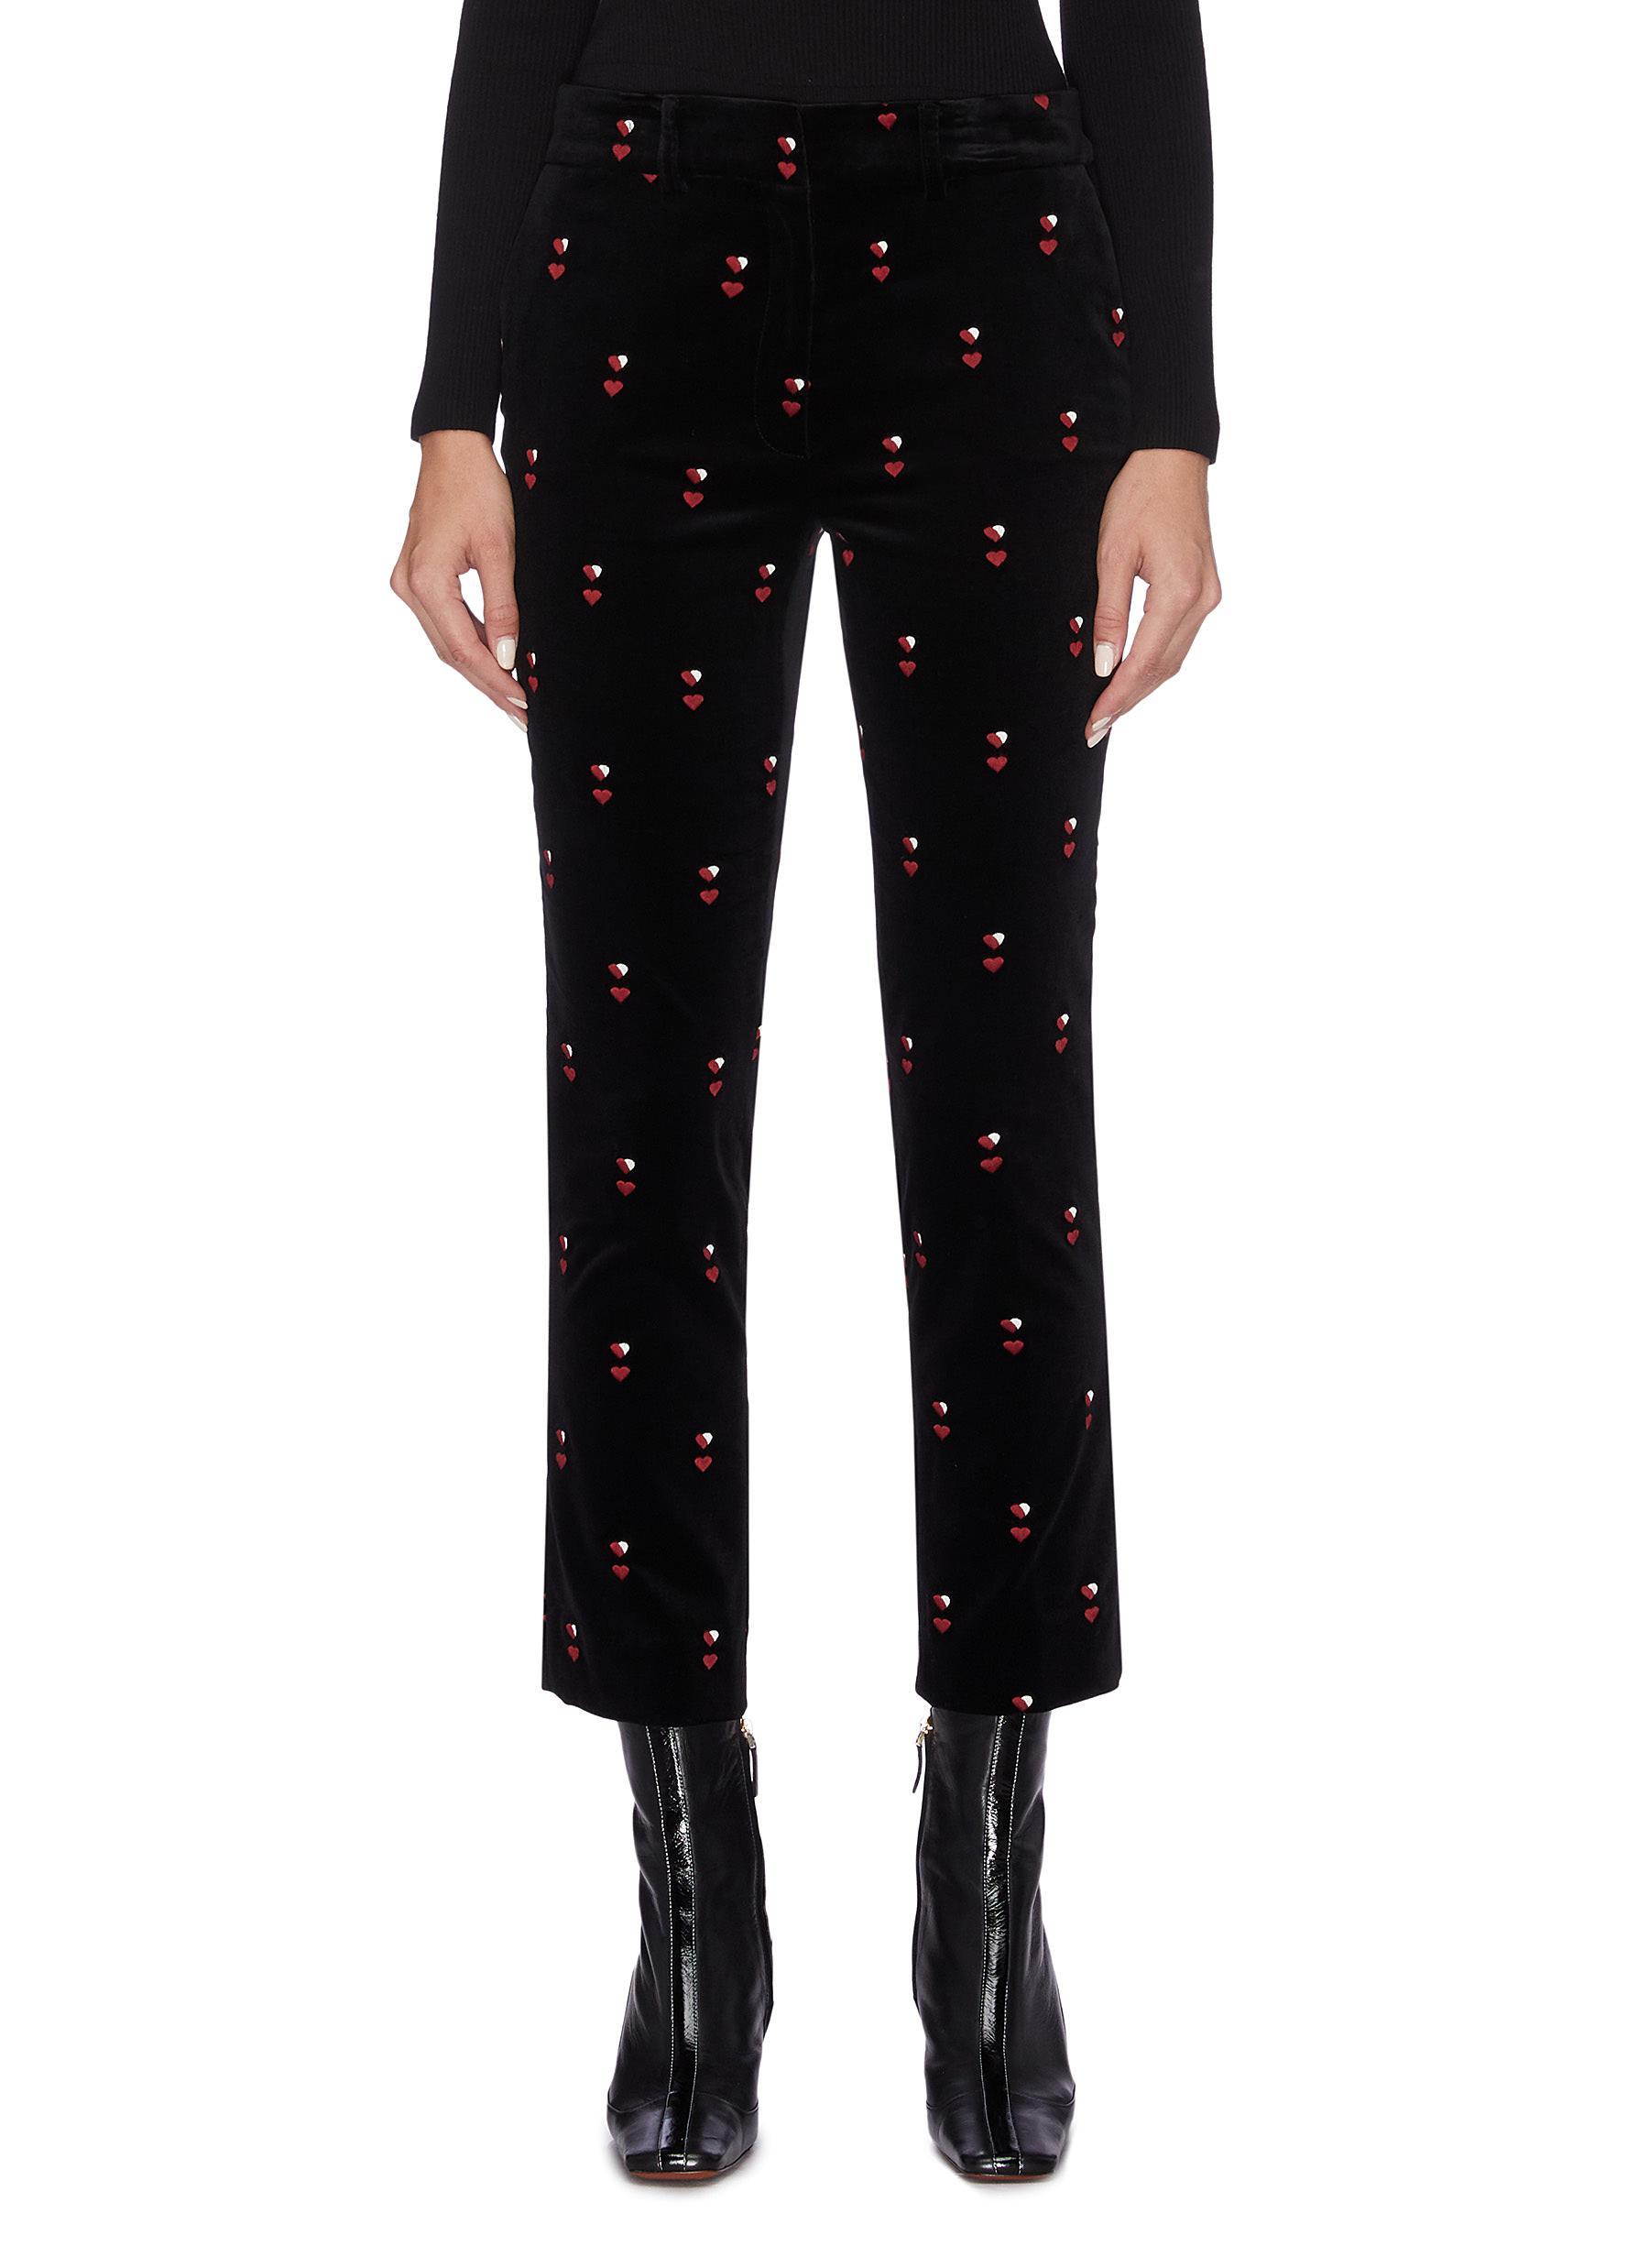 Heart embroidered cropped velvet pants by Frame Denim